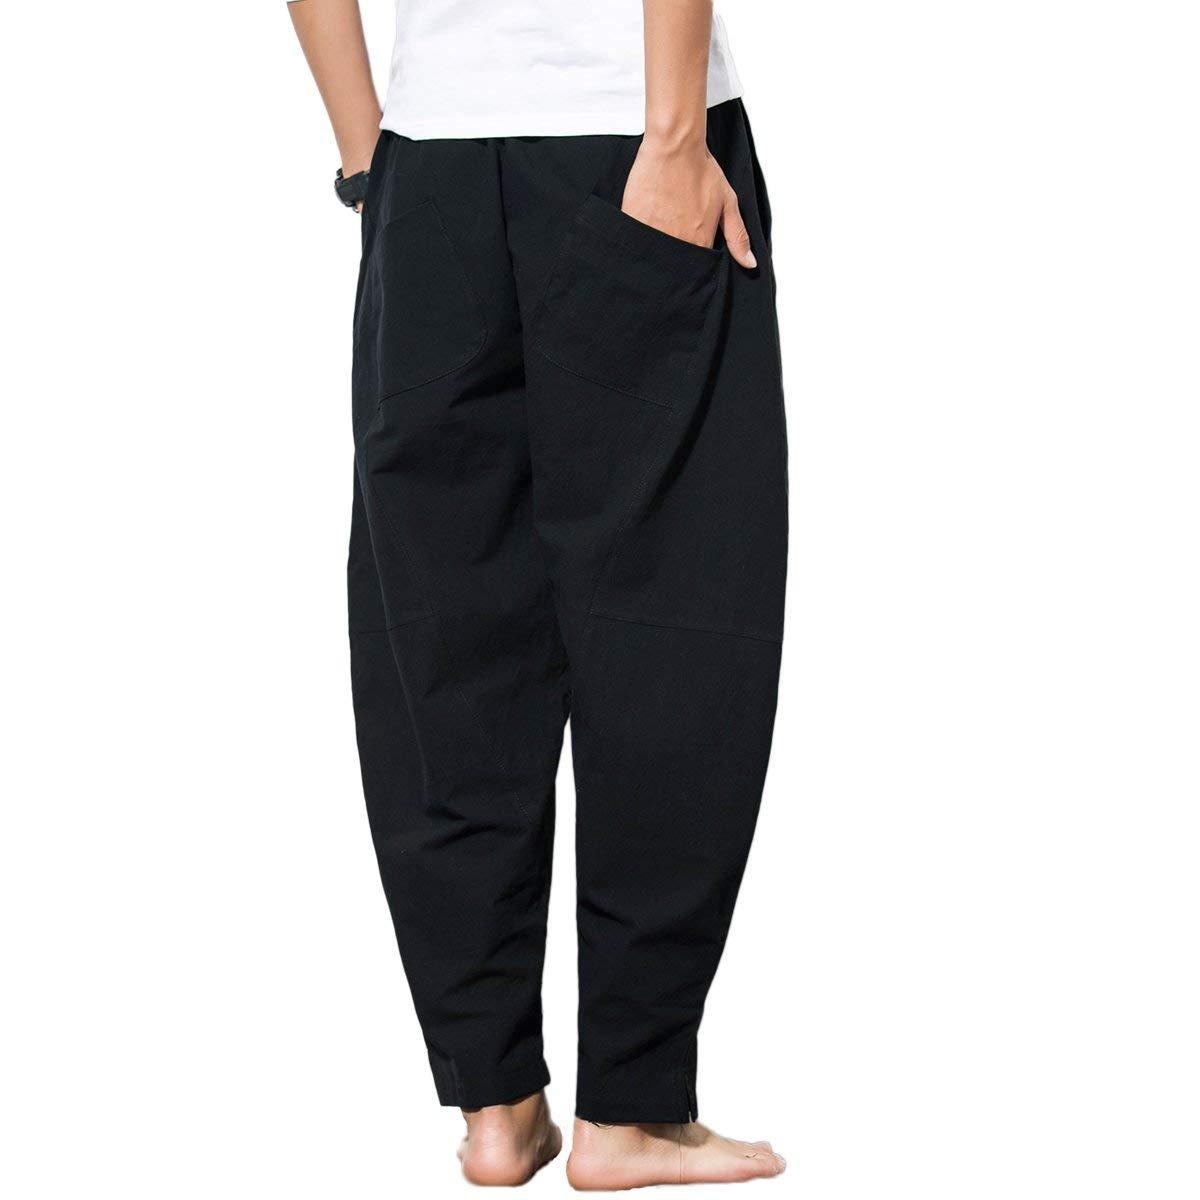 Capri Baggy Pantalones Lino Hombre Harem Tienew Casual Pantalón xPYZ4wPqO